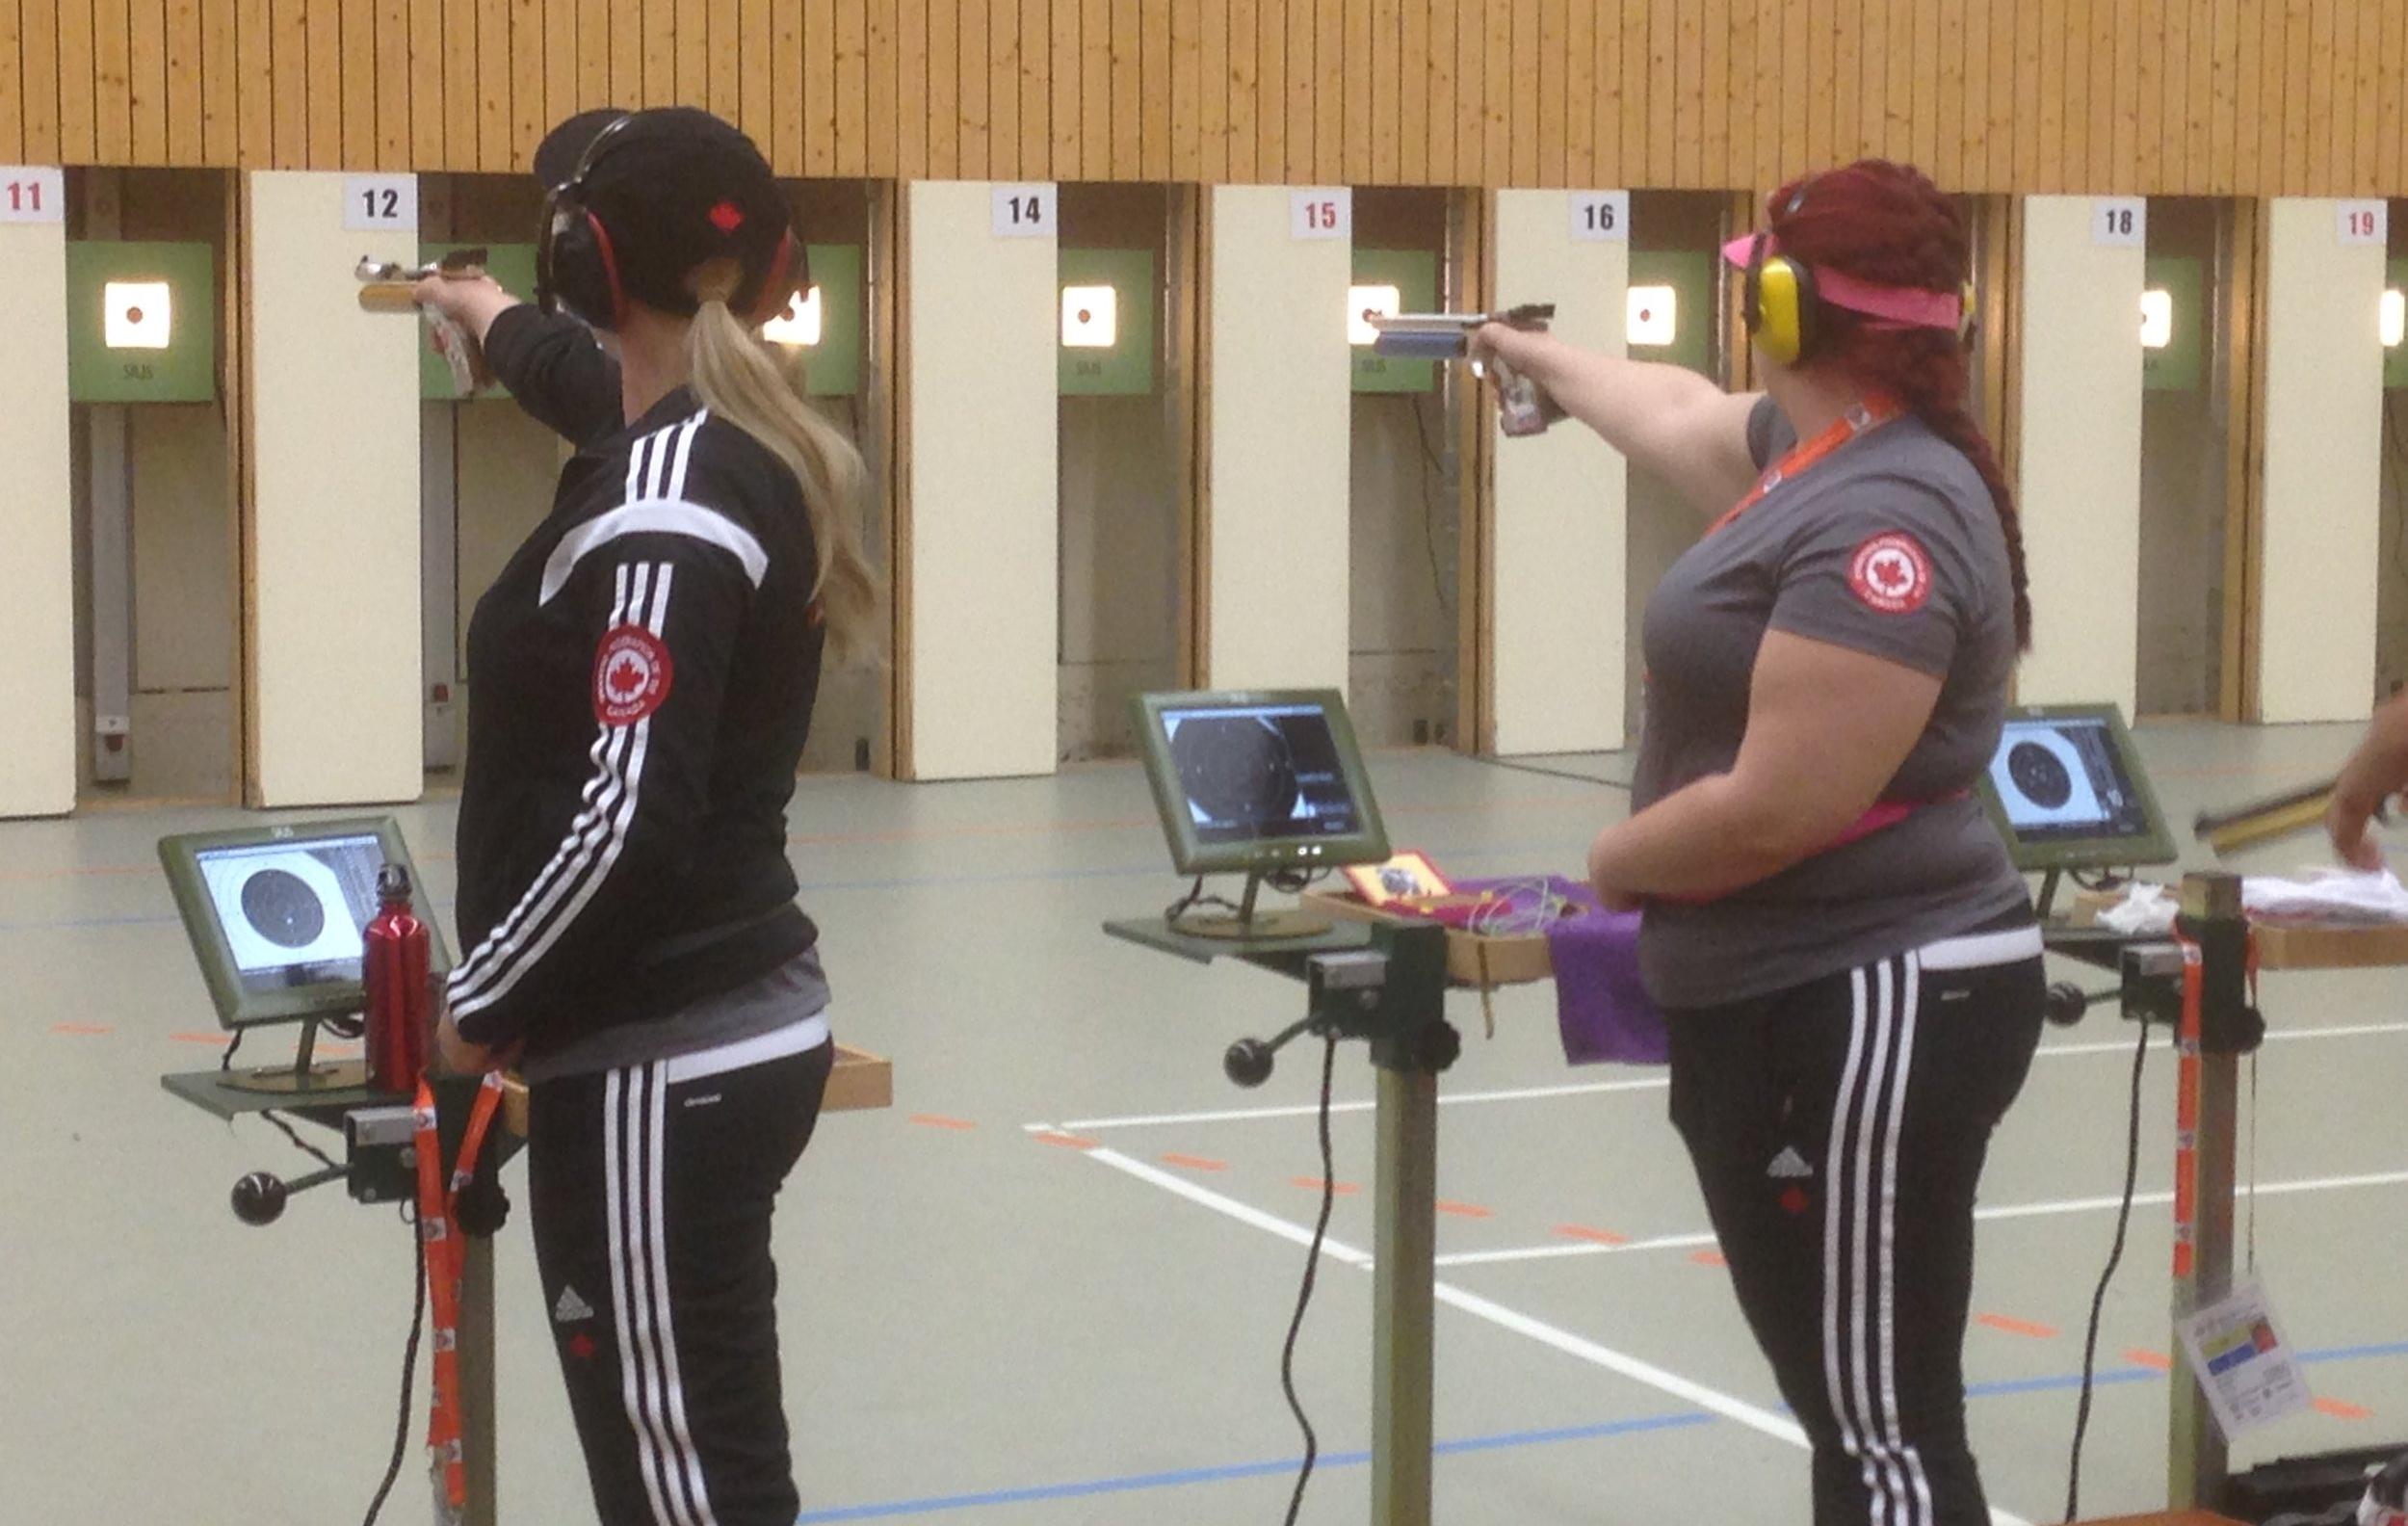 2015 Junior Cup, Suhl, Germany Ashley Pickert (AB), Veronika Schulze (AB - CRPC)